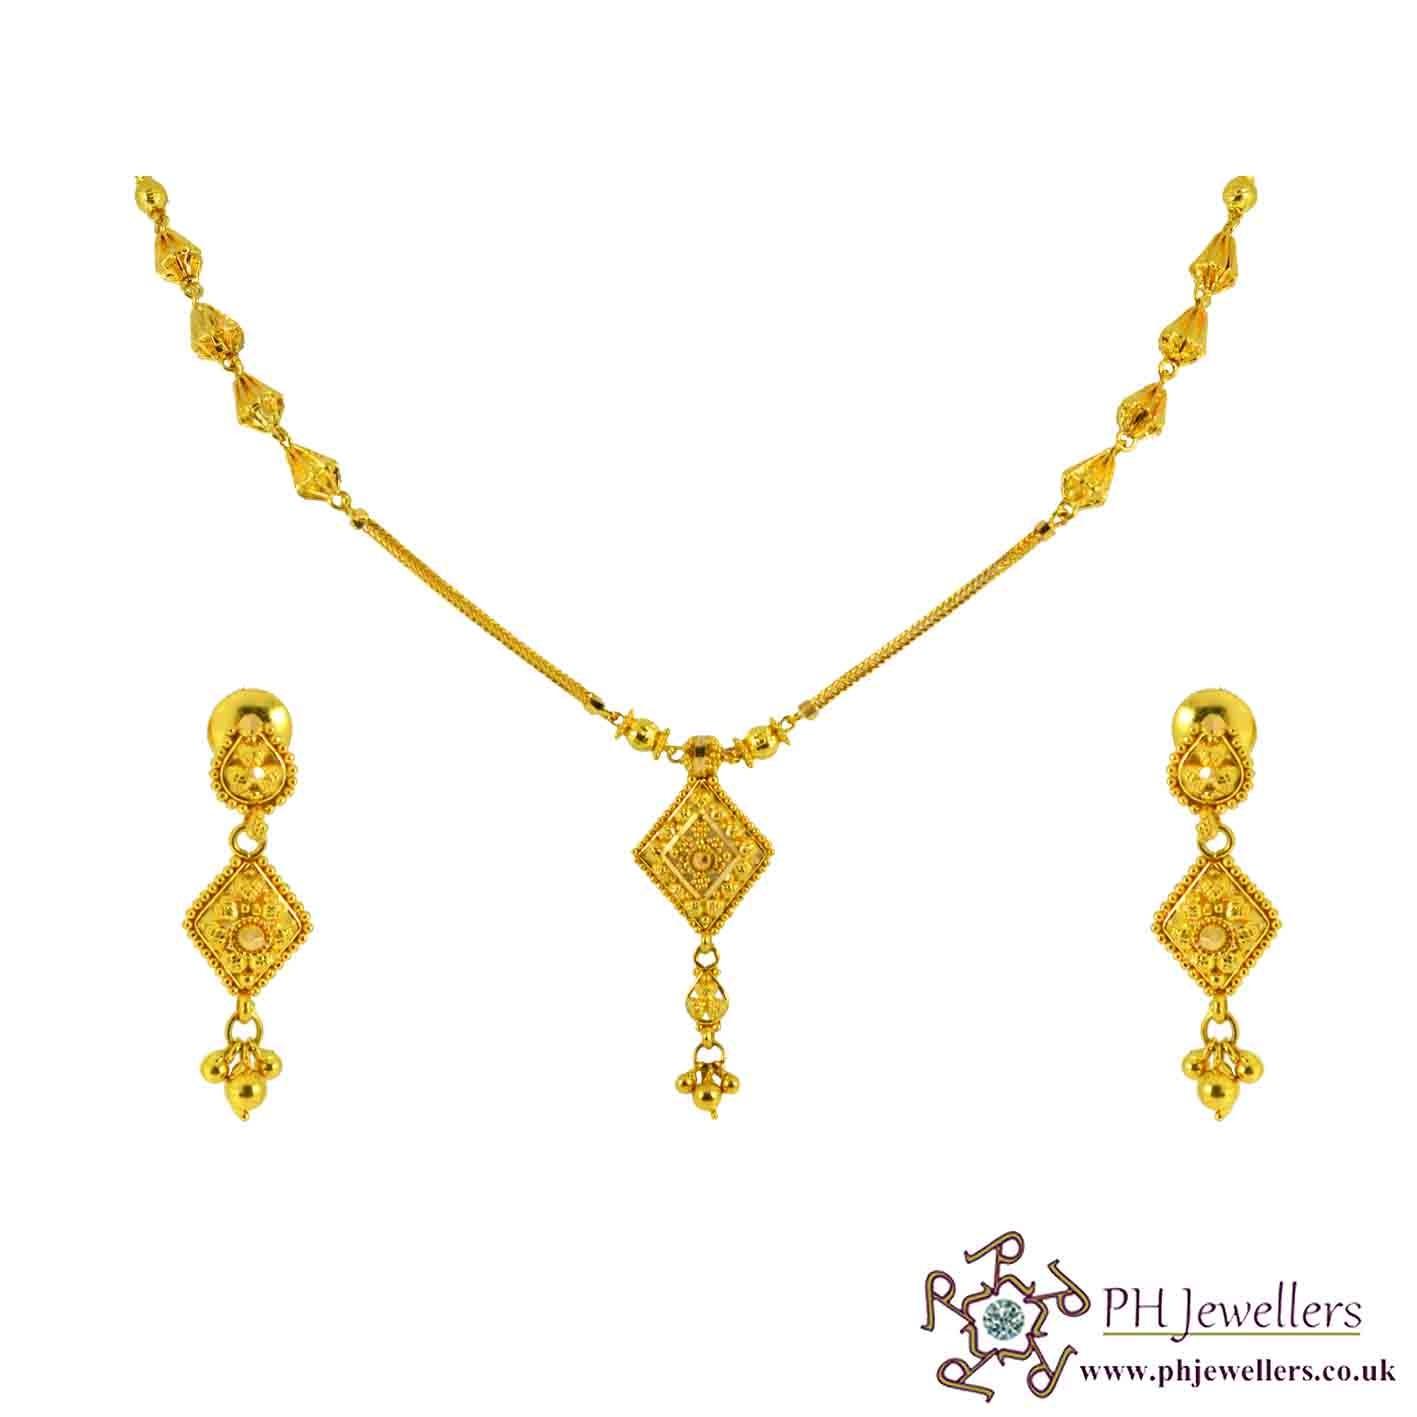 22ct 916 Hallmark Yellow Gold Necklace Set NCK6